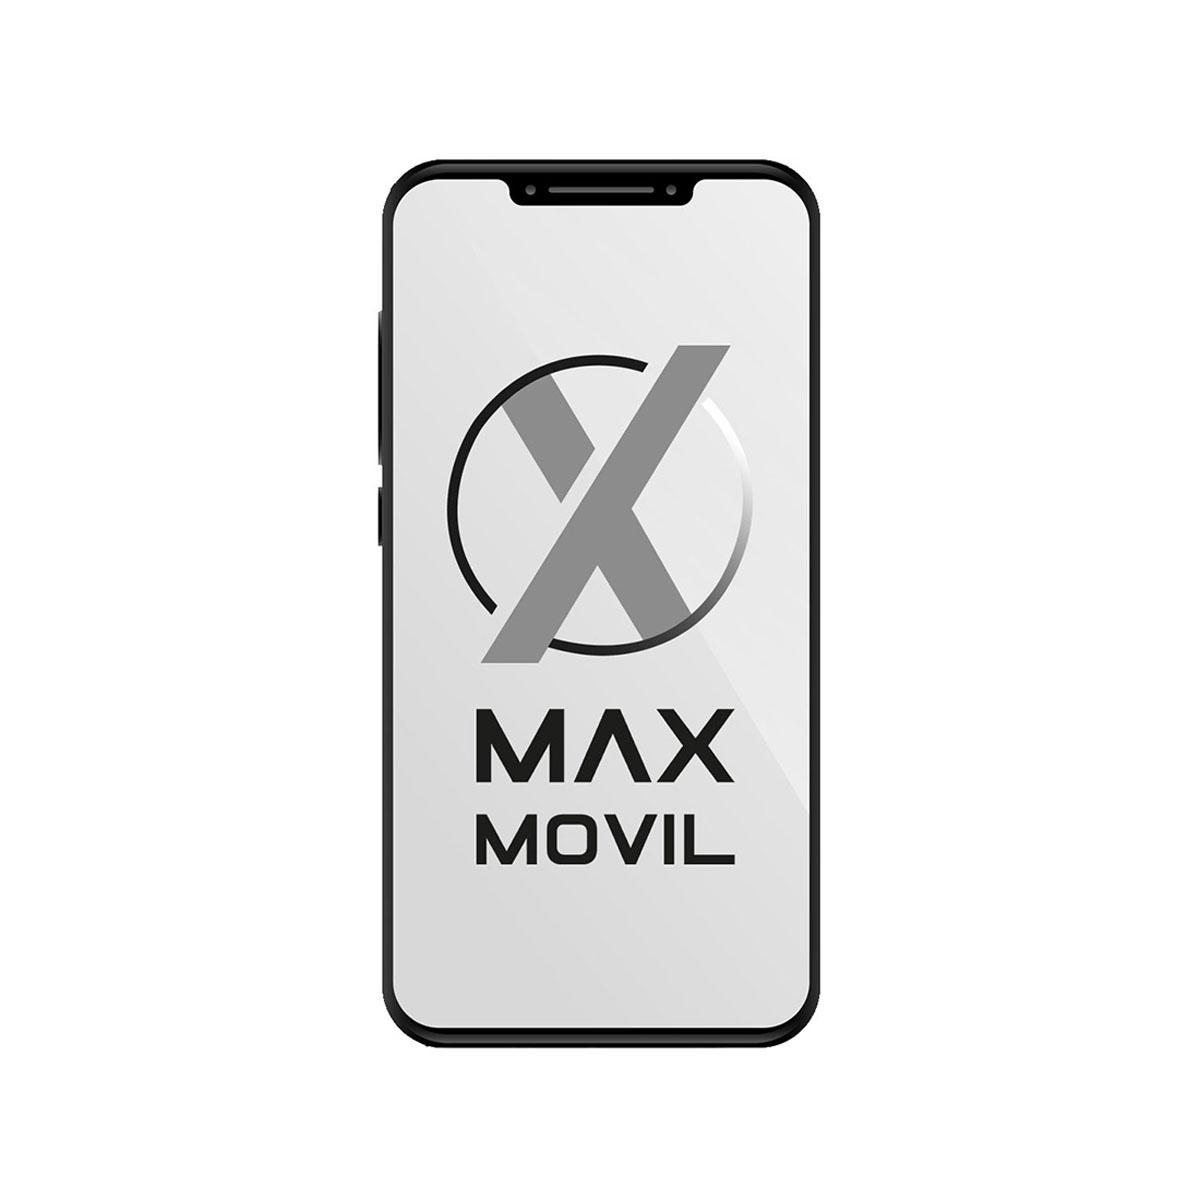 Apple iPhone SE (2020) 64GB Rojo (PRODUCT) RED MX9U2QL/A